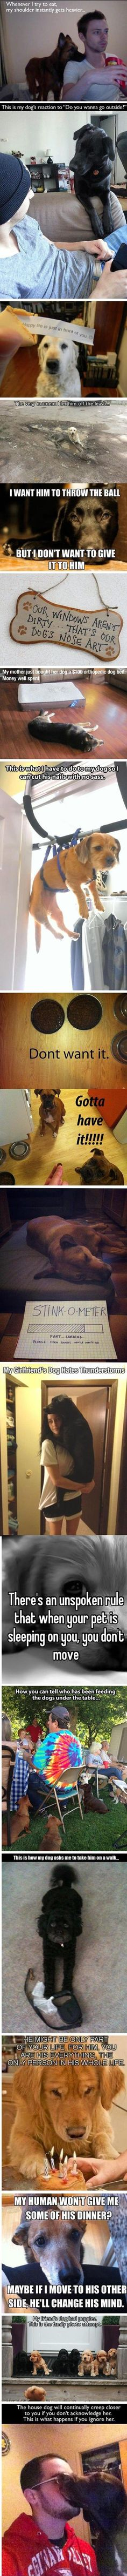 Hundebesitzer kennen es   Webfail - Fail Bilder und Fail Videos